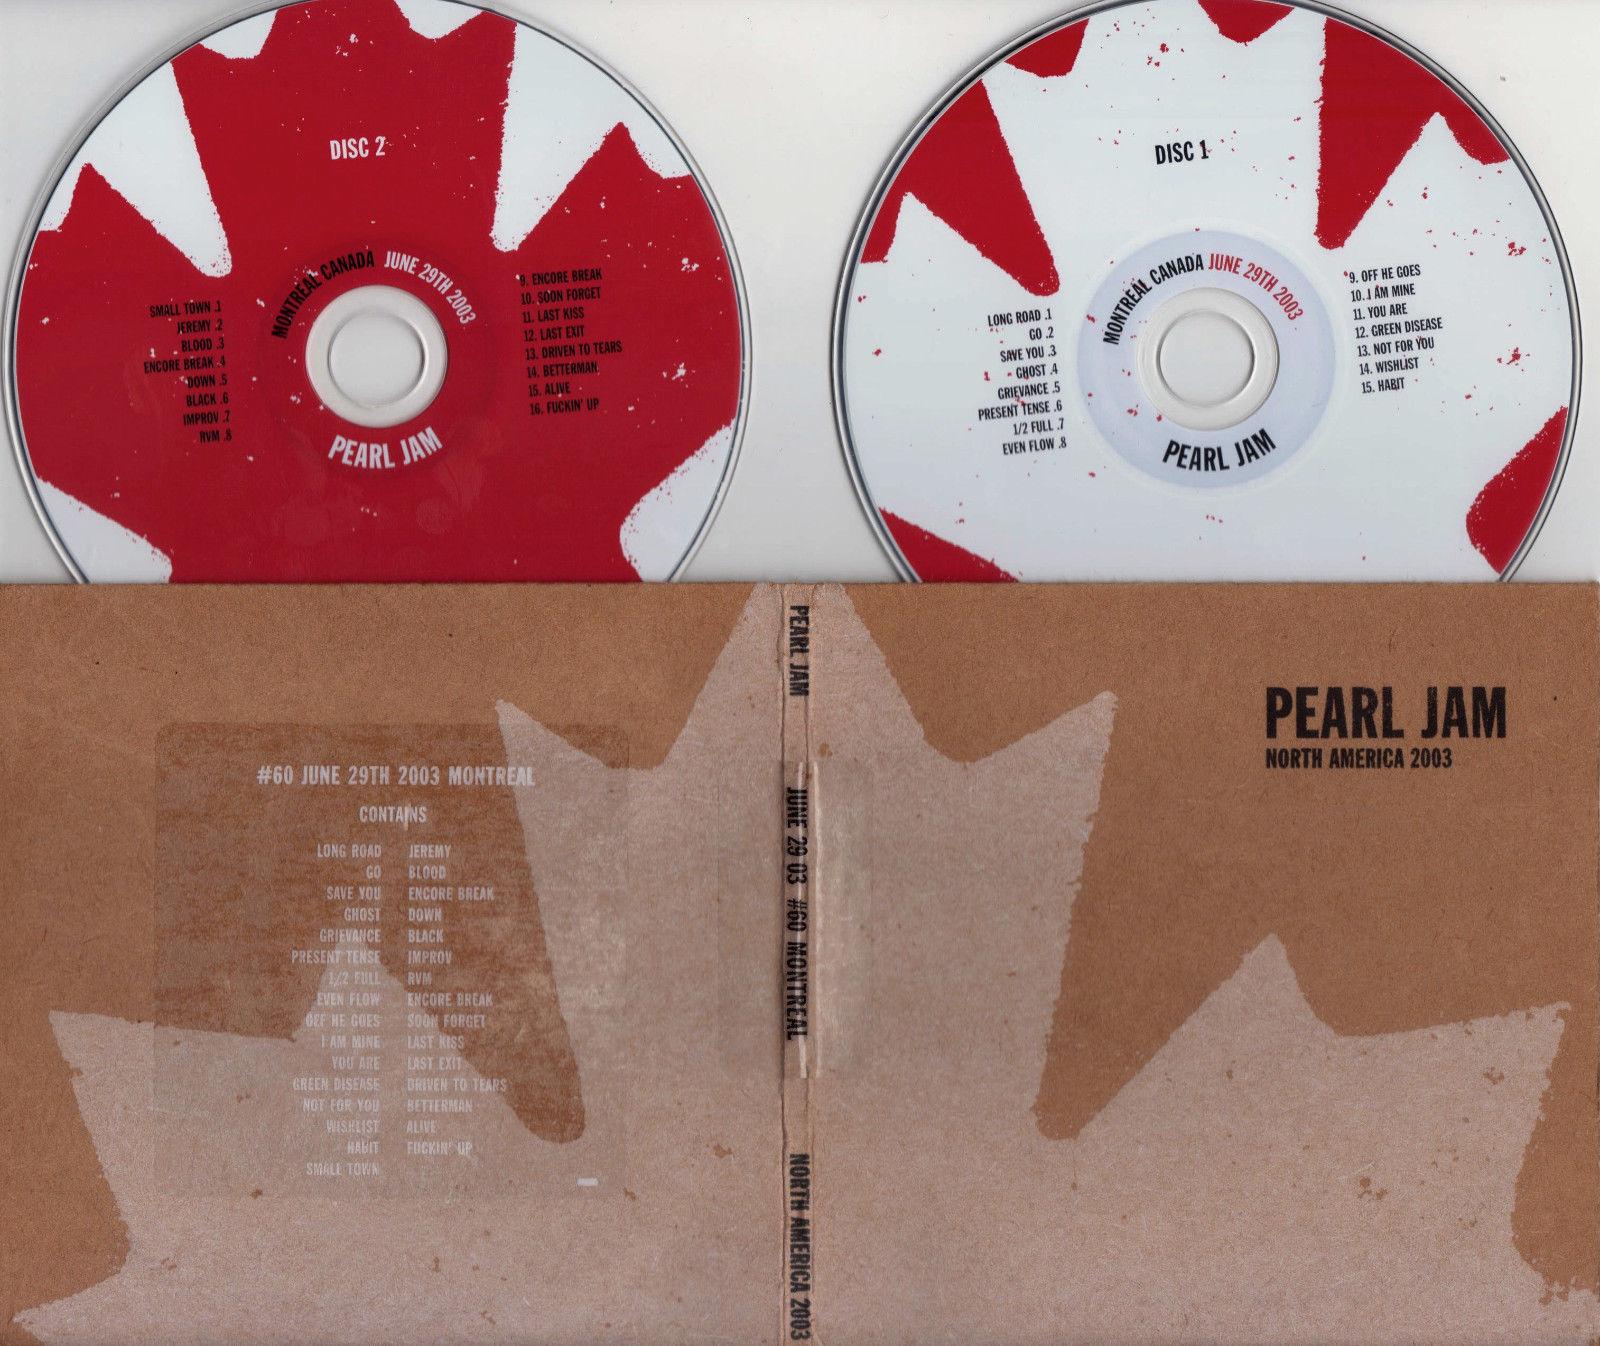 popsike com - Pearl Jam Live Official Bootleg #60 Montreal Quebec